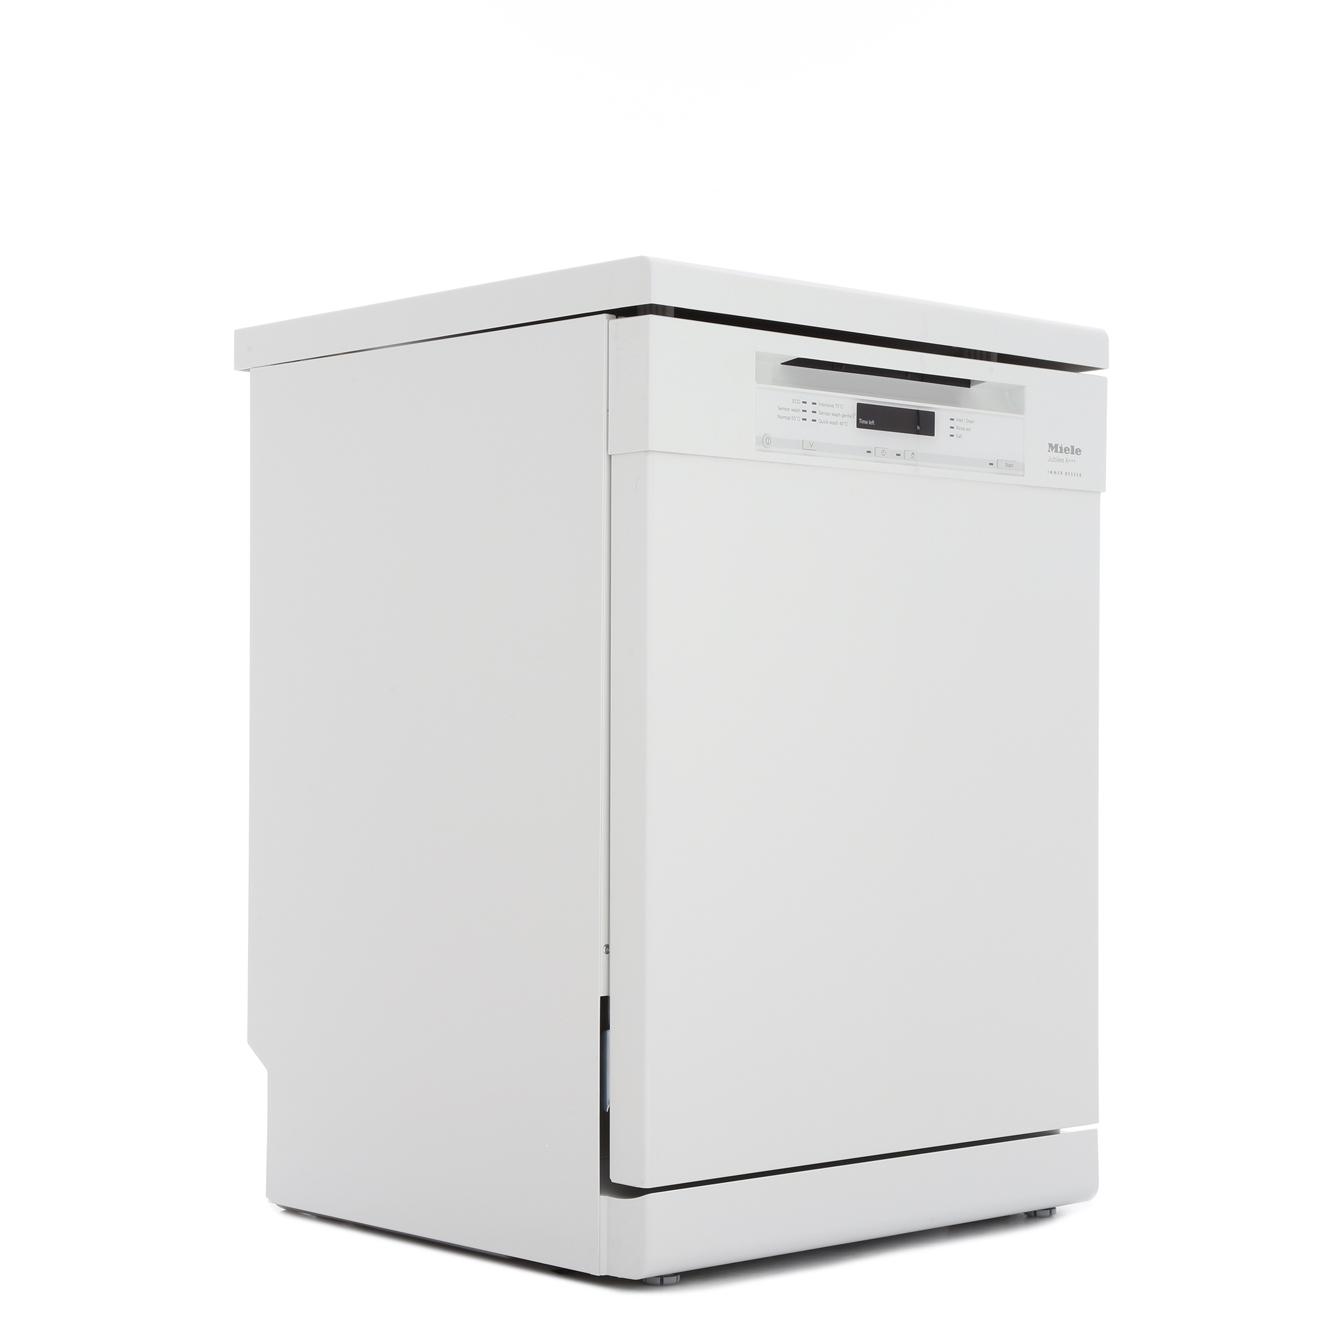 buy miele g6000sc jubilee dishwasher g6000scjubilee white marks electrical. Black Bedroom Furniture Sets. Home Design Ideas